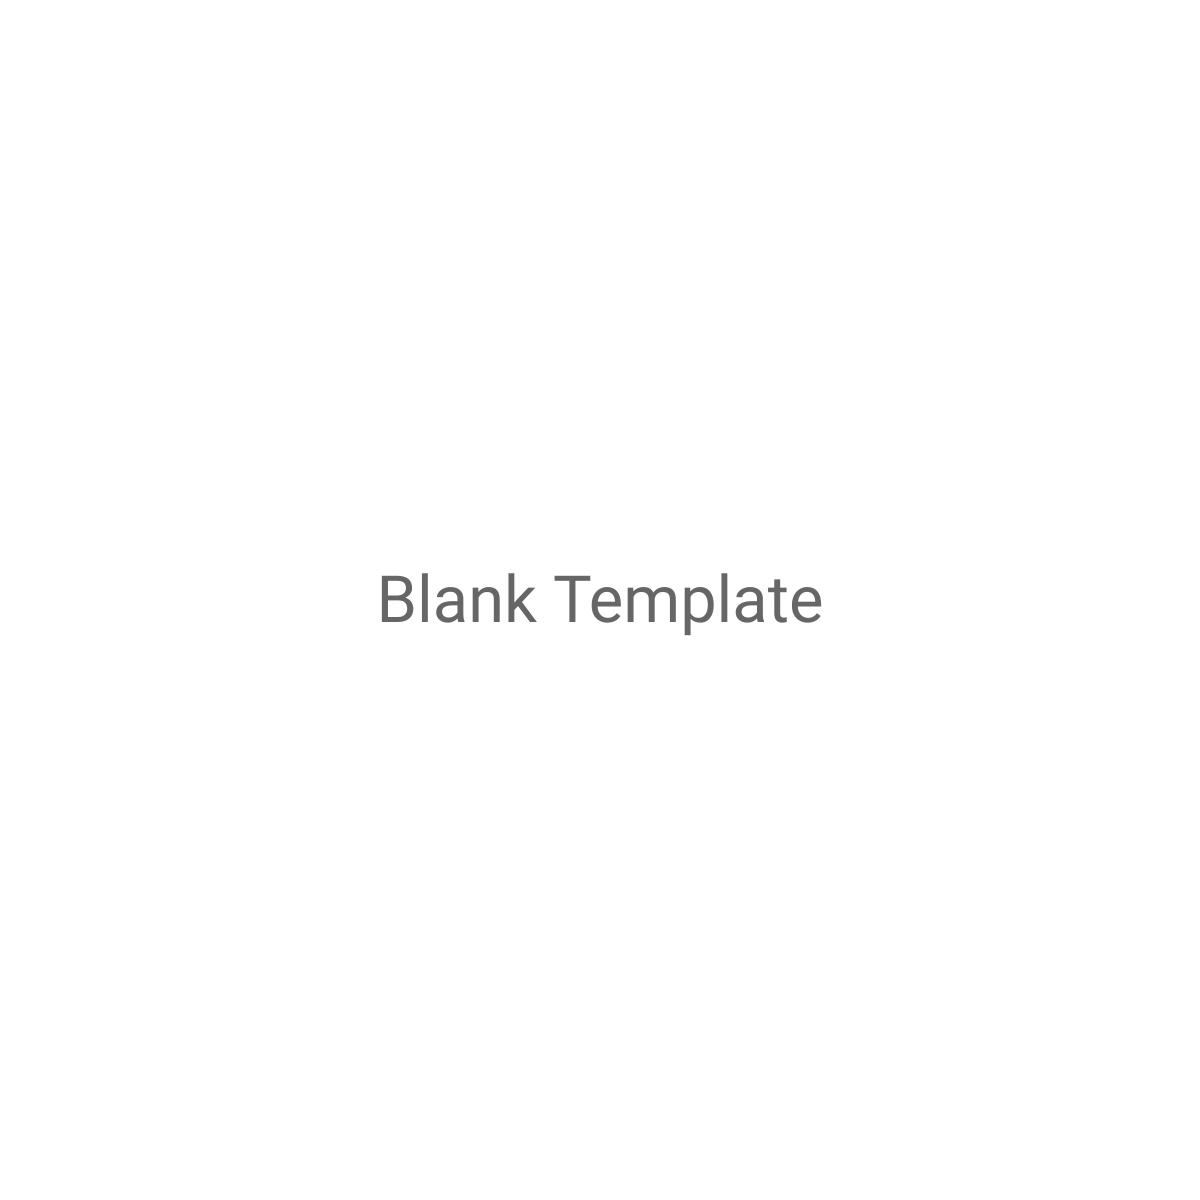 Blank Template LinkedIn Posts Template